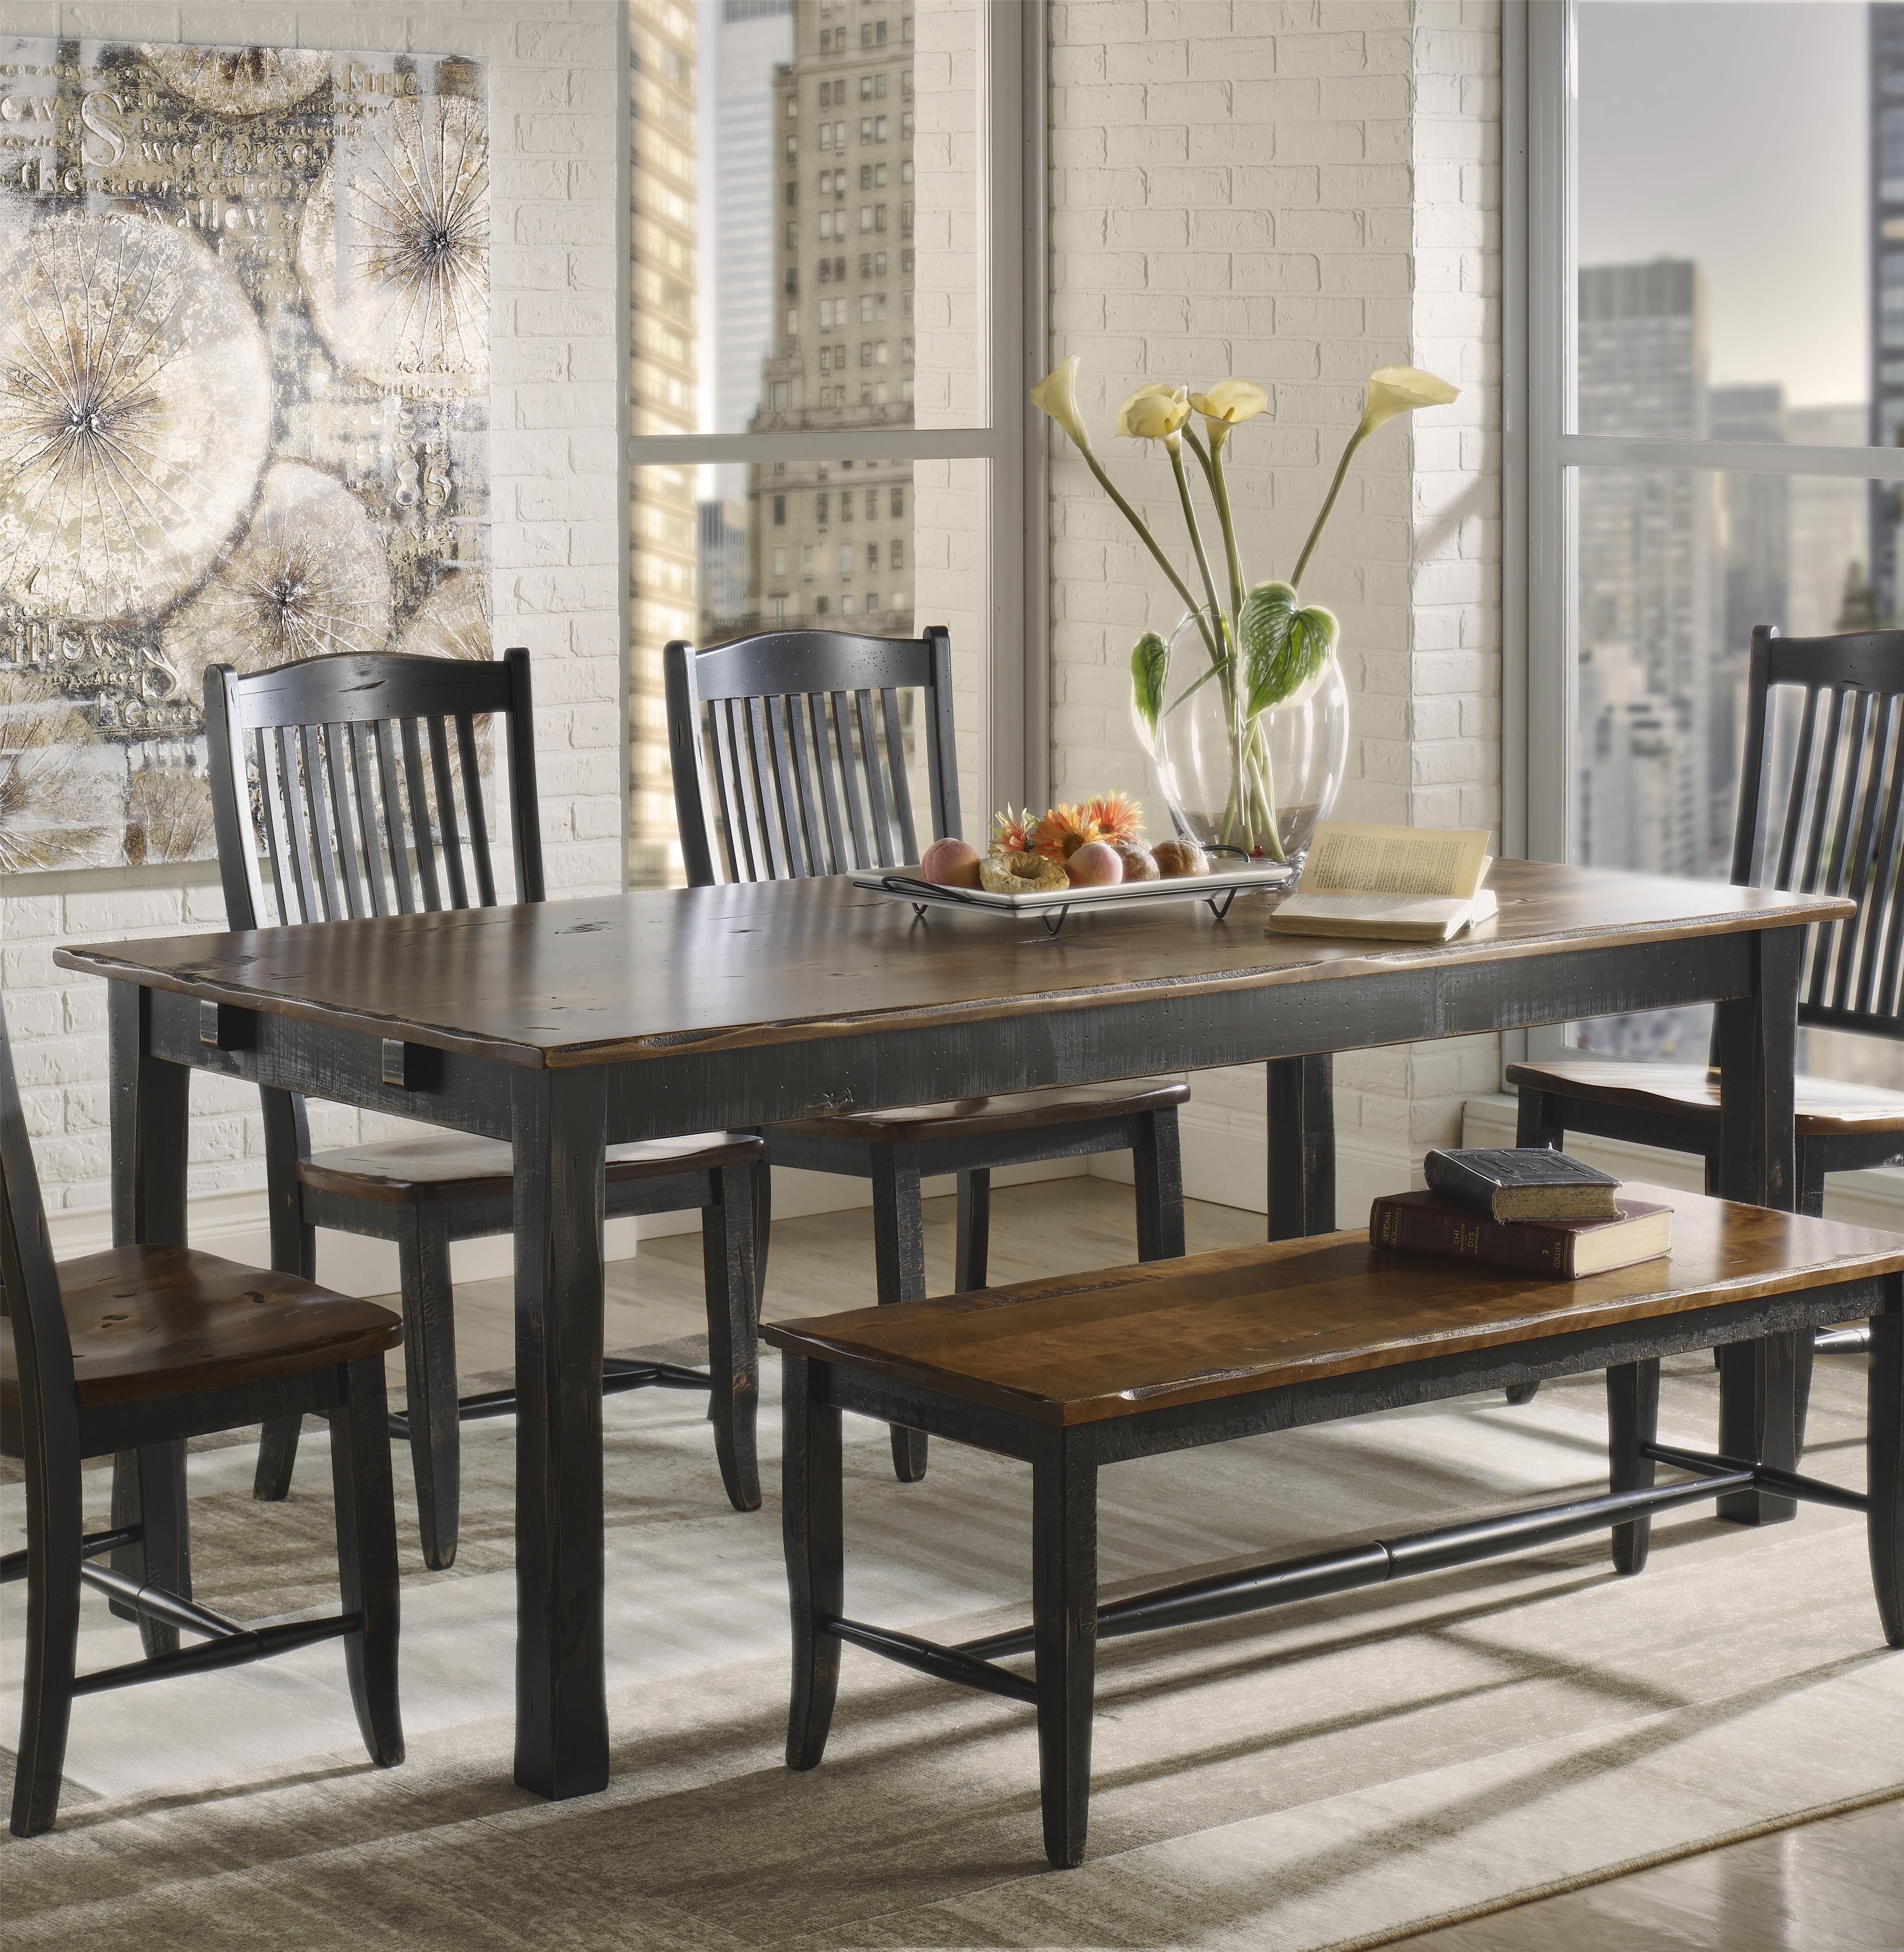 canadel champlain custom dining tre038783363dhfnf customizable rectangular table dunk. Black Bedroom Furniture Sets. Home Design Ideas